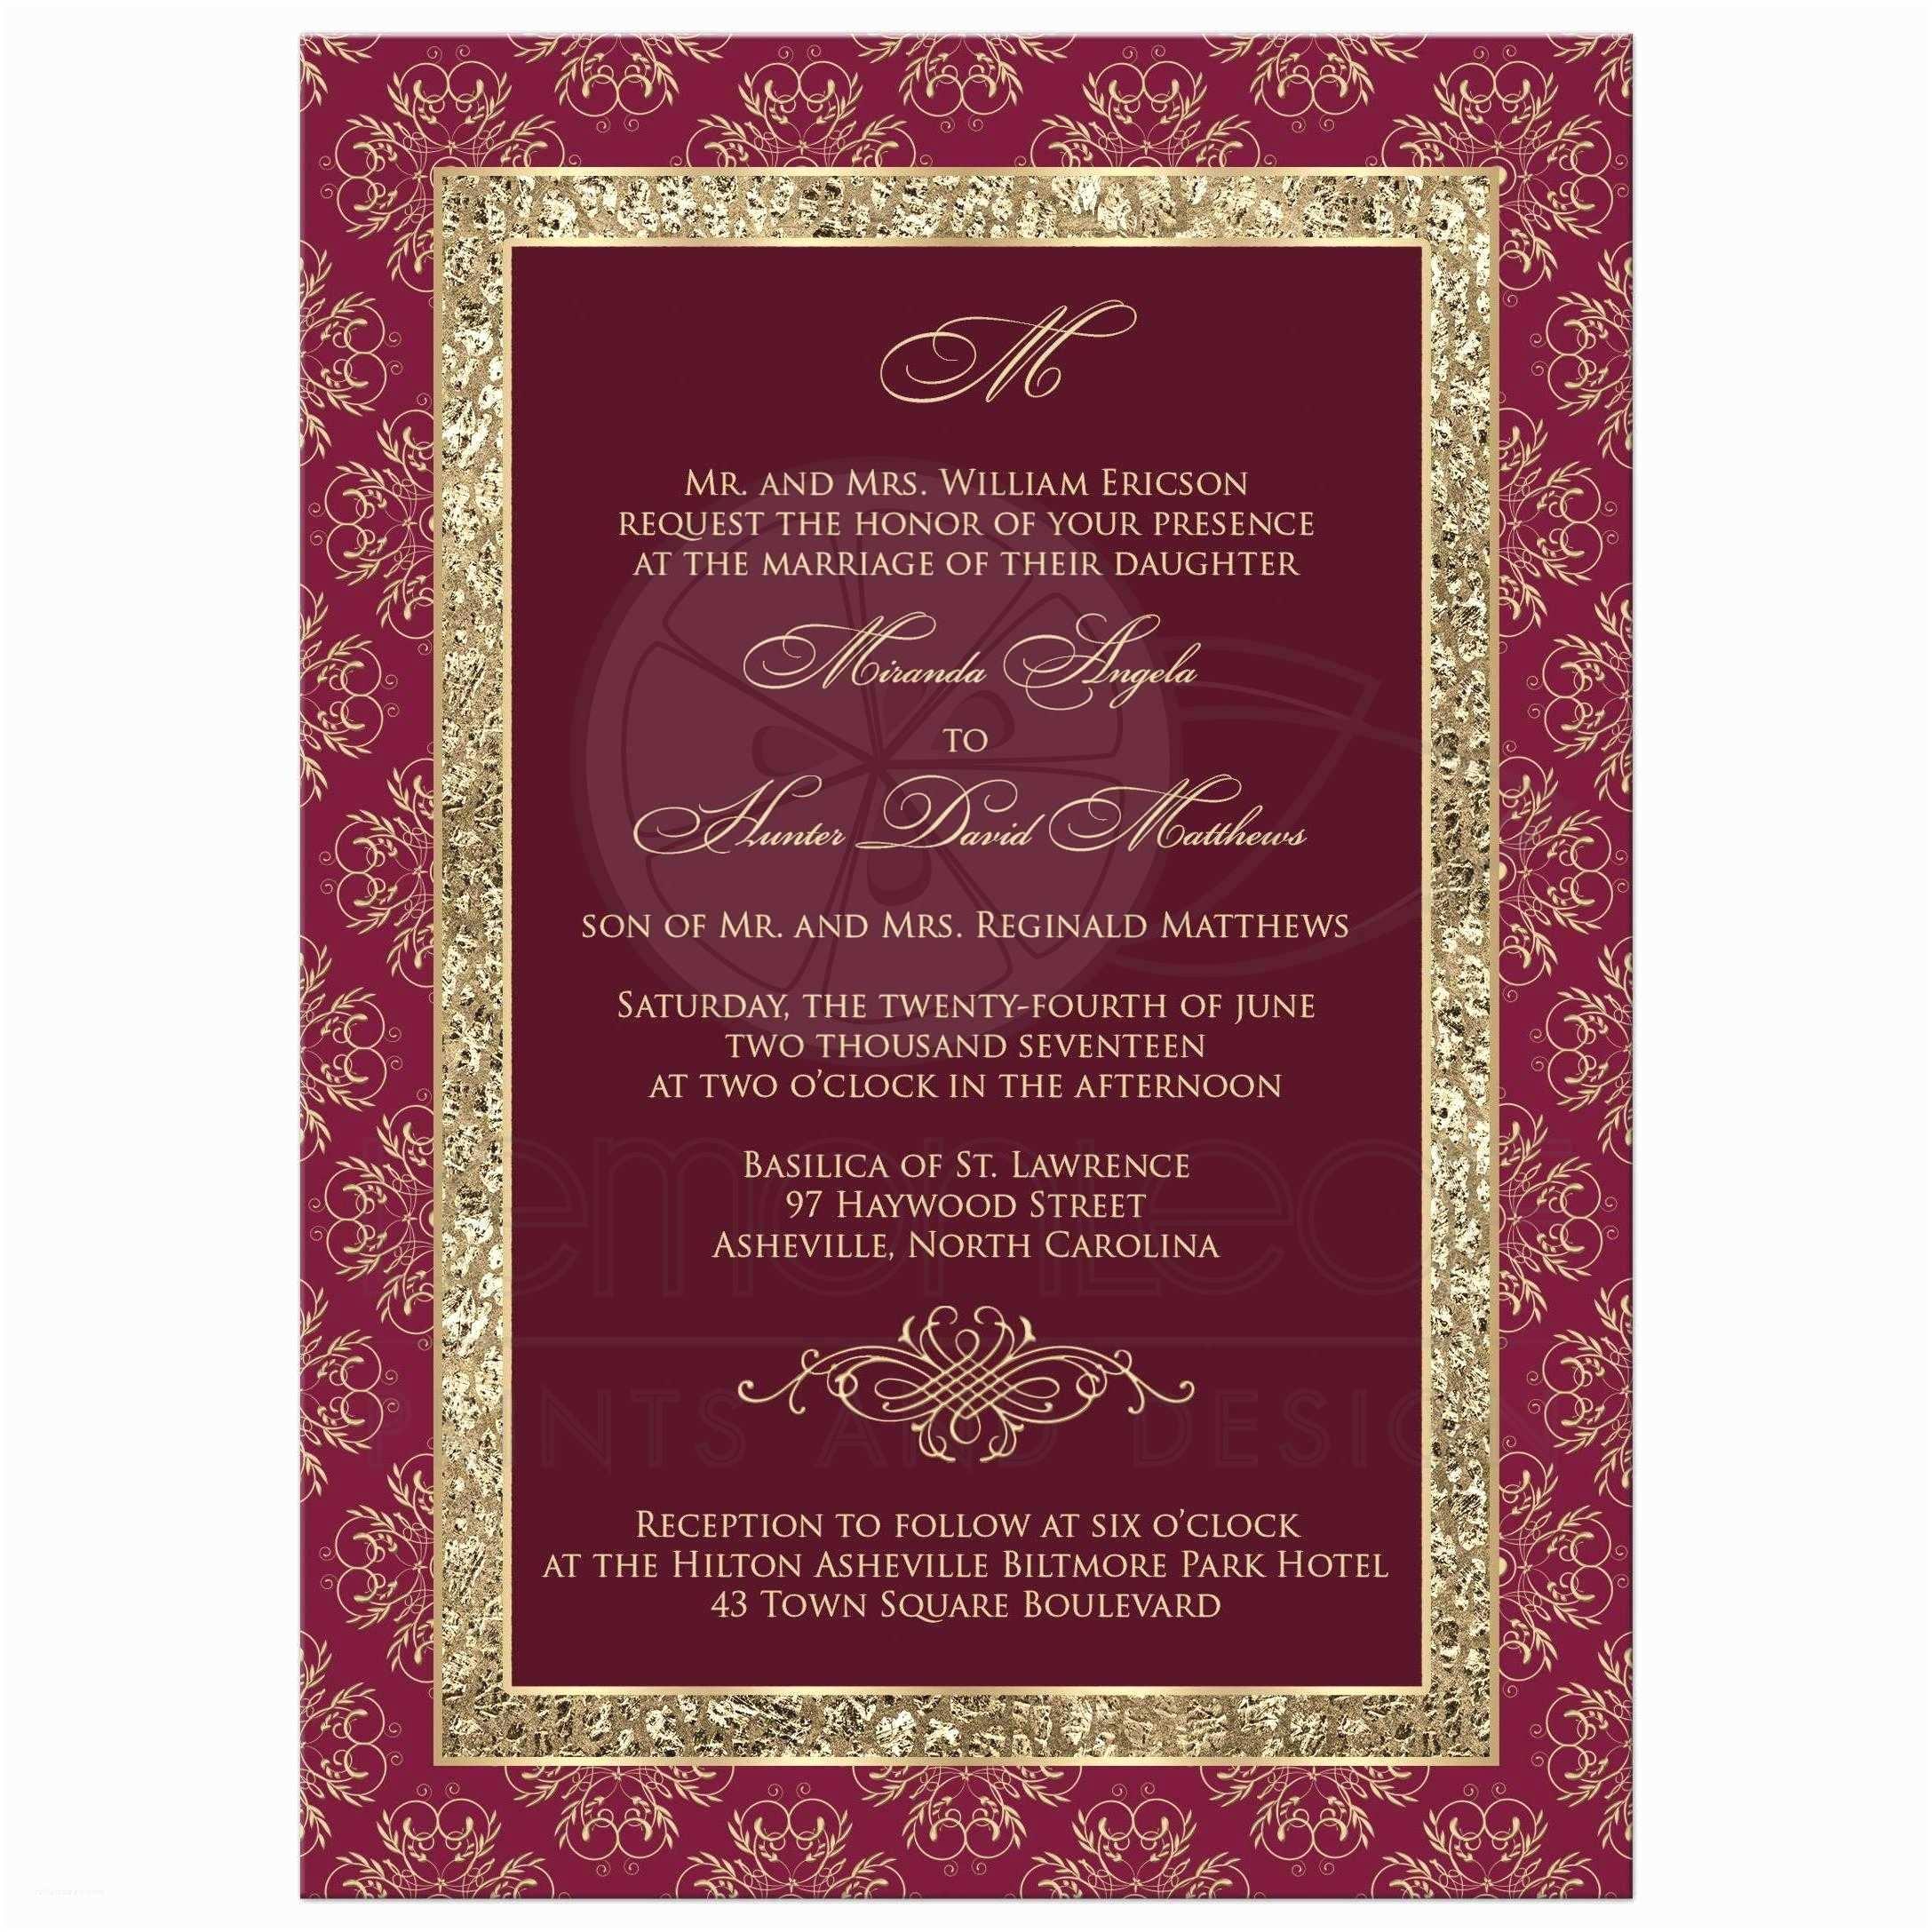 Burgundy Wedding Invitations Wedding Invitation Burgundy Gold Elegance